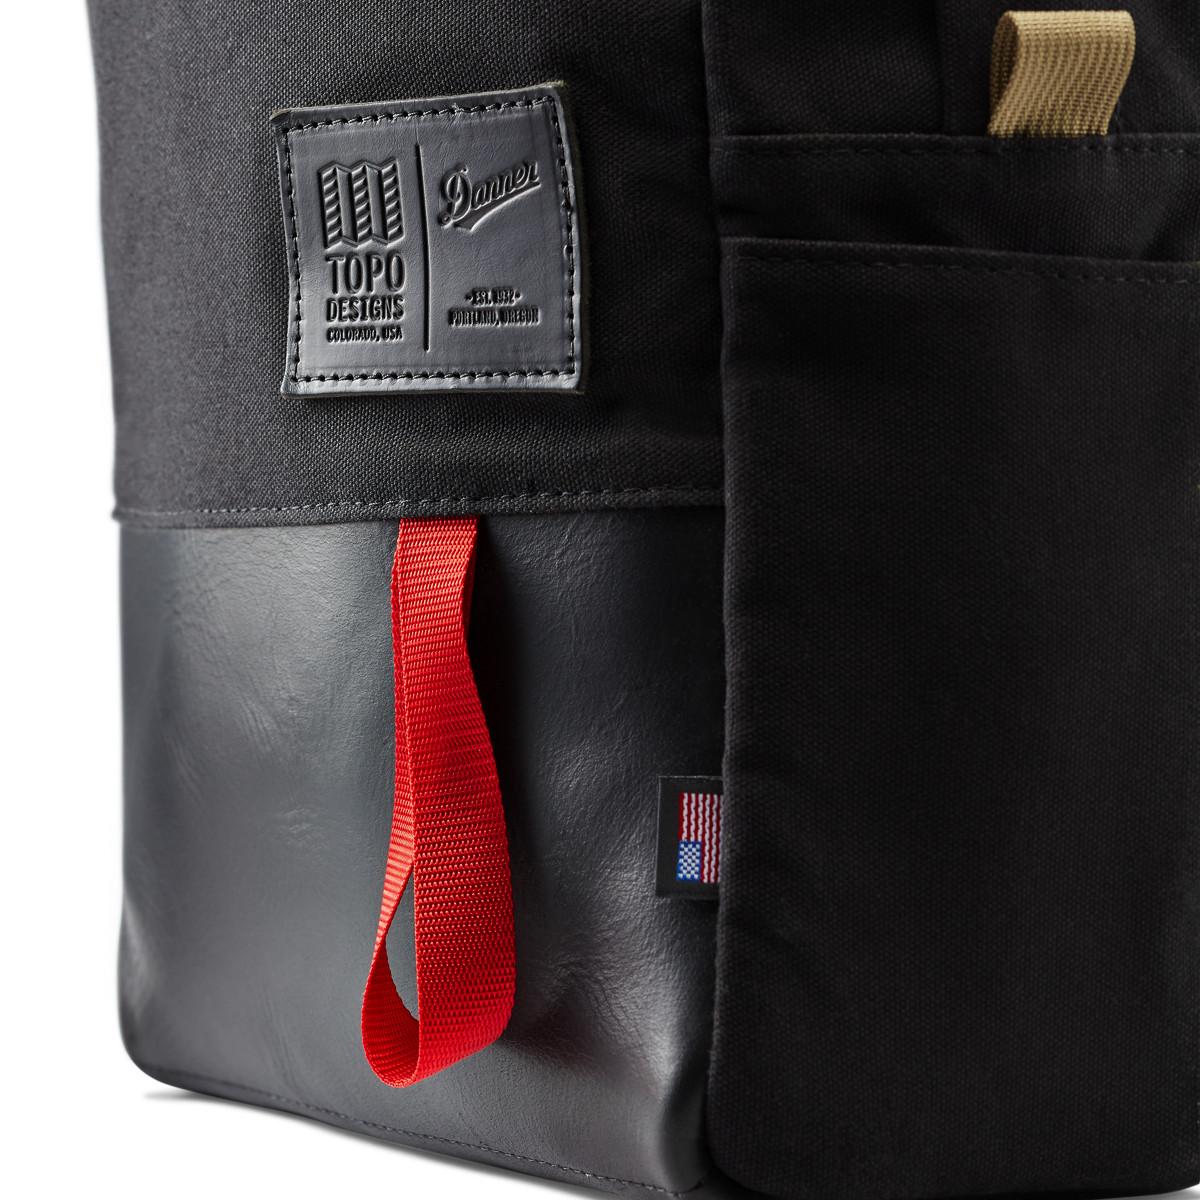 Topo Designs x Danner Daypack - Black